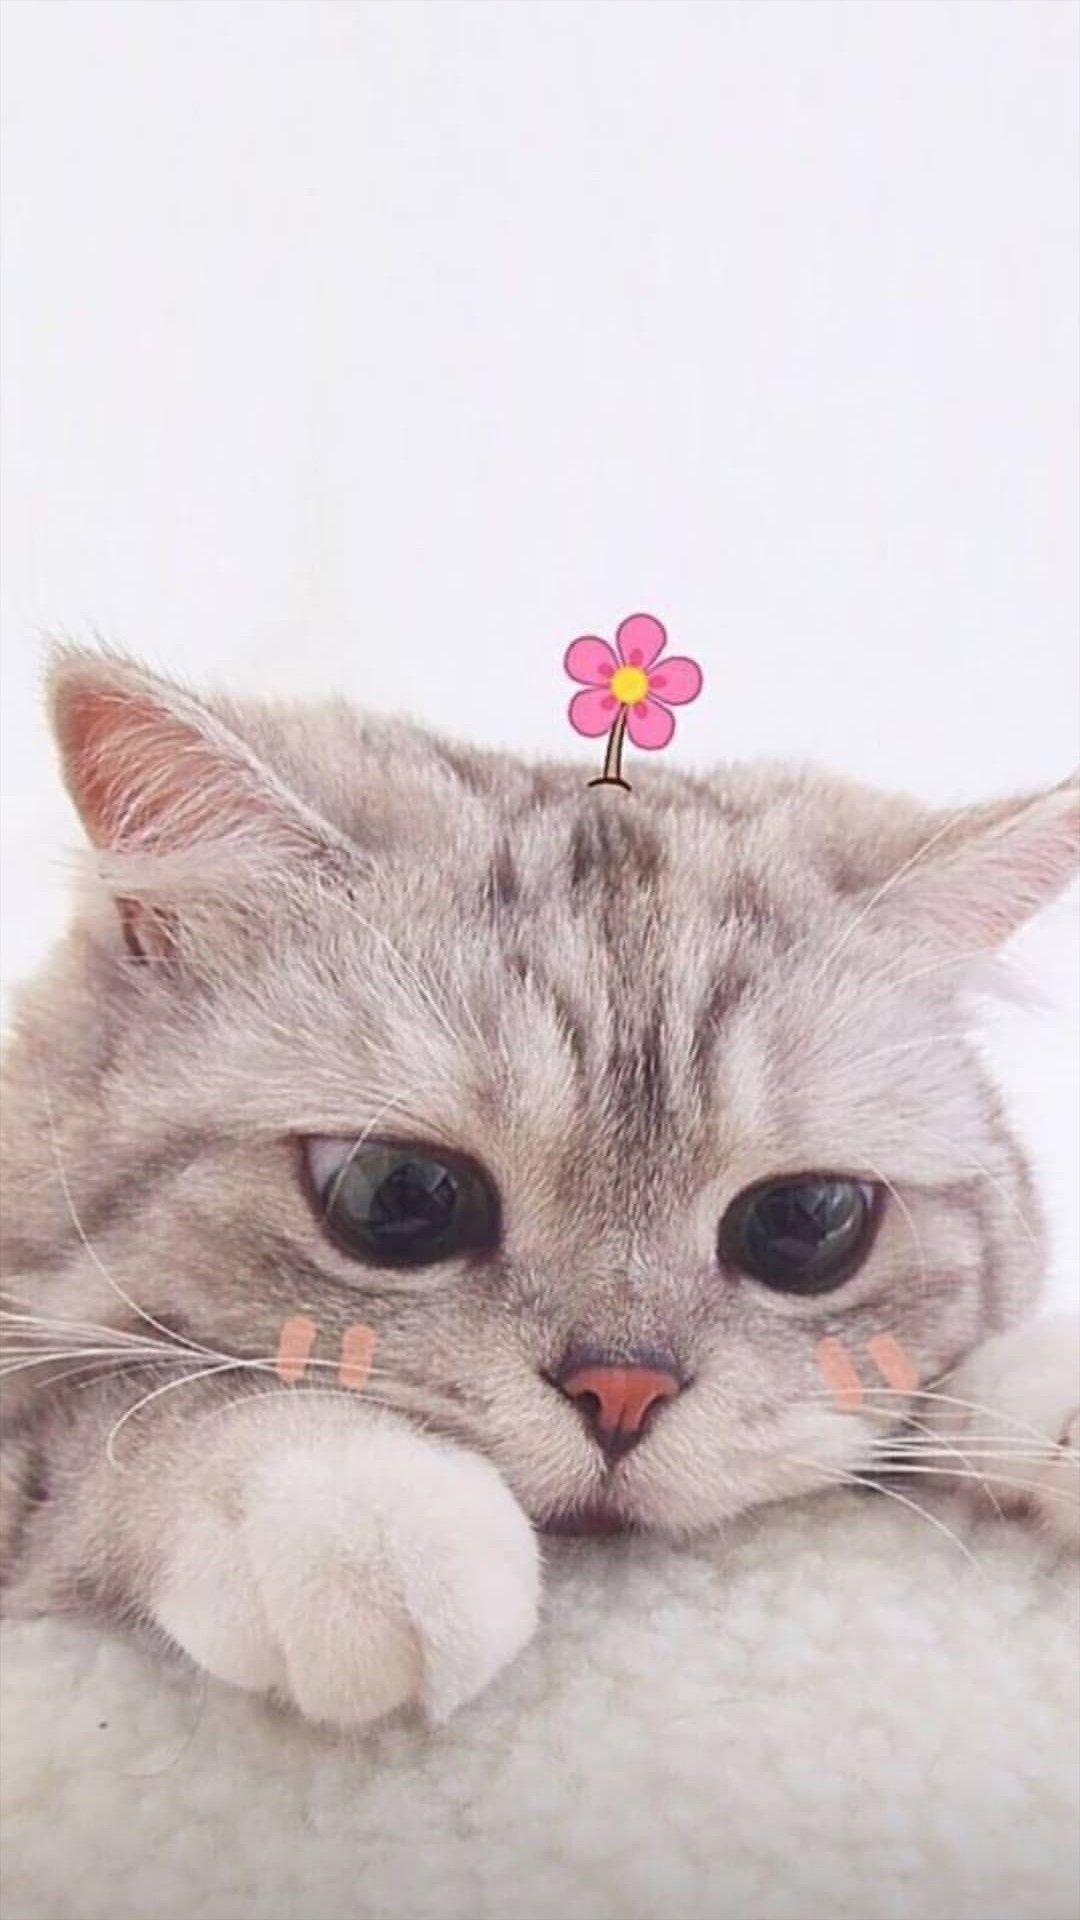 Wallpaper Kucing Cantik Gambar Anjing Lucu Fotografi Hewan